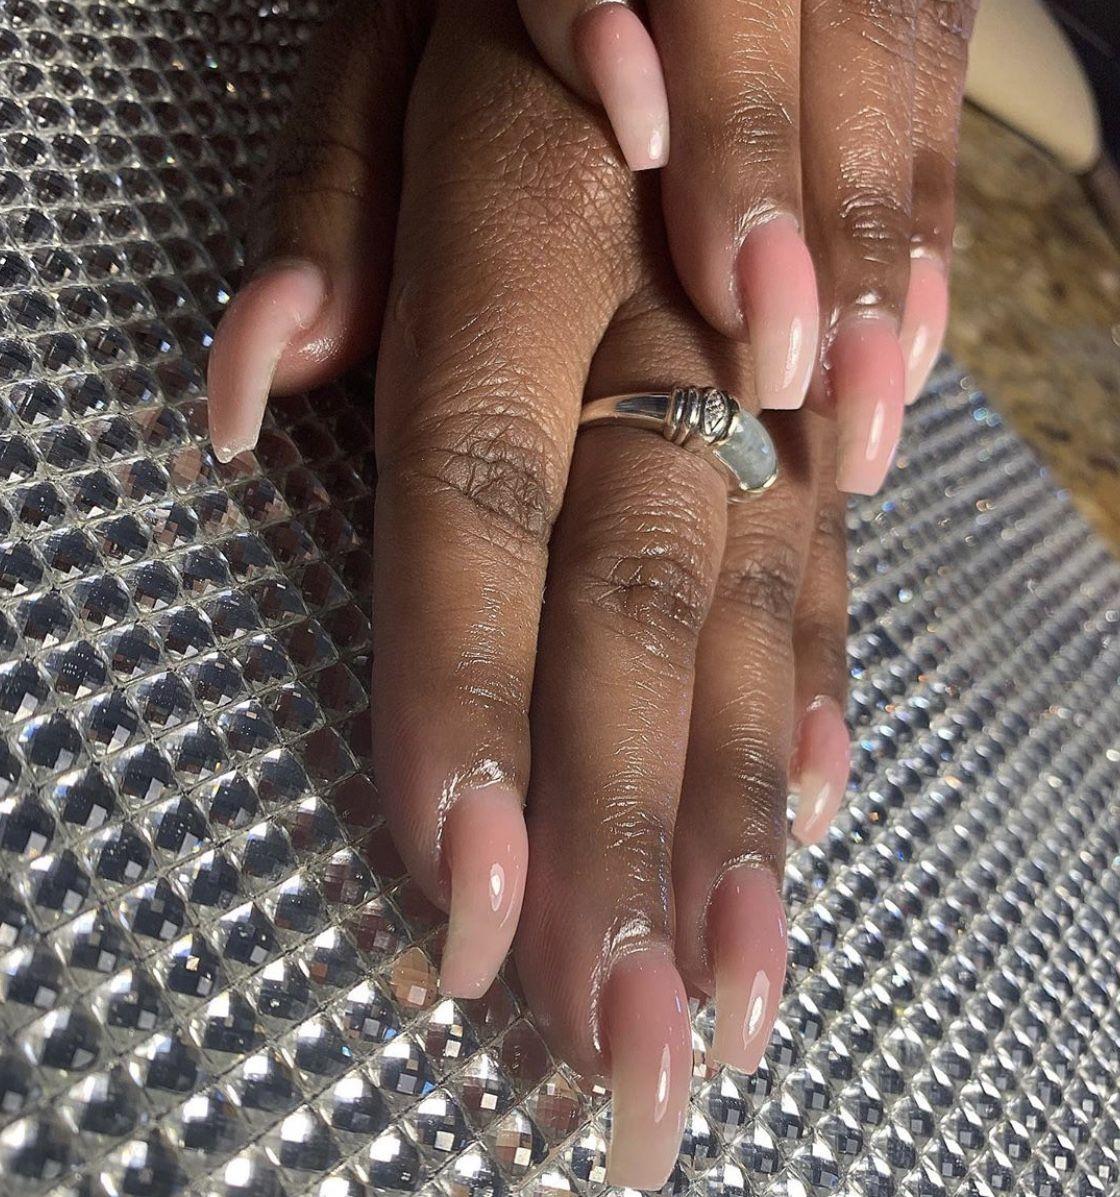 Nails Youngnails Synergygel Gelnails Classynails Naturalnails Squarenails Nailideas Nailsofinstagram Nailedit Brow In 2020 Sugar Nails Square Nails Nail Spa